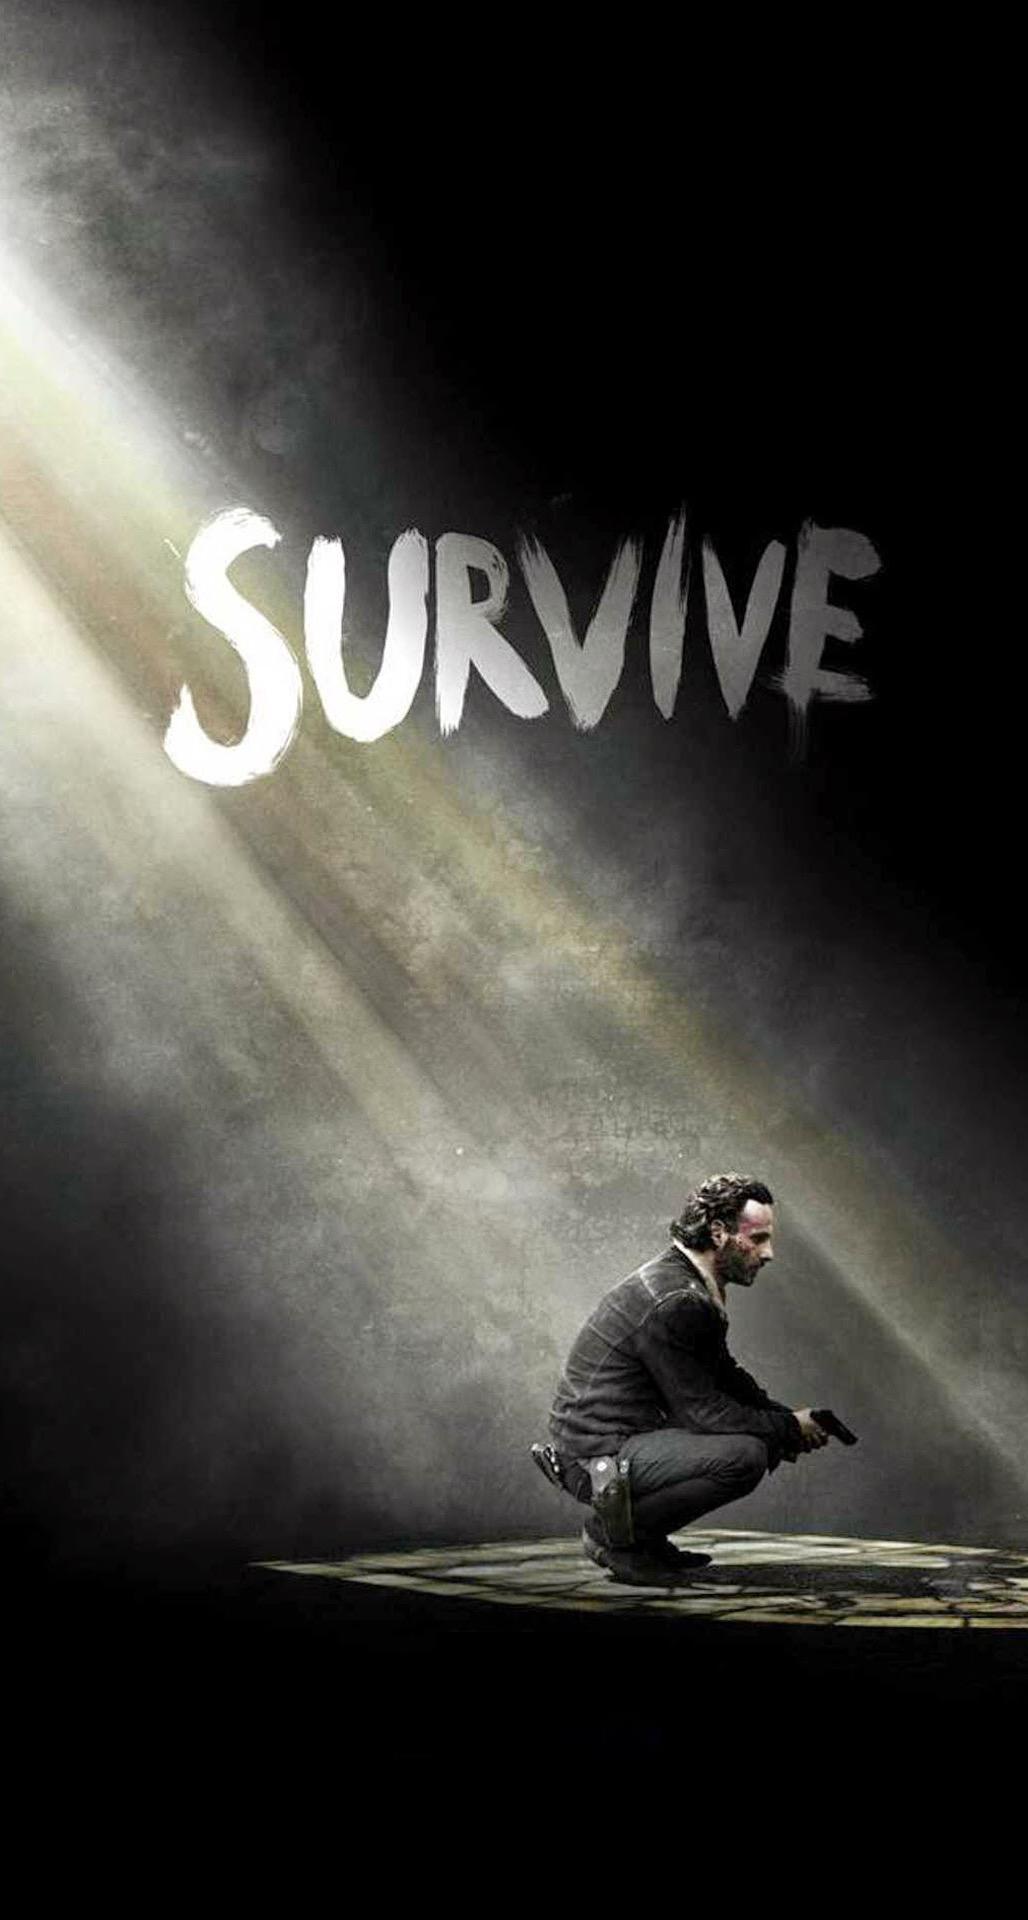 Download-The-Walking-Dead-Season-Survive-Rick-iPhone-Plus-HD-wallpaper-wp5805197